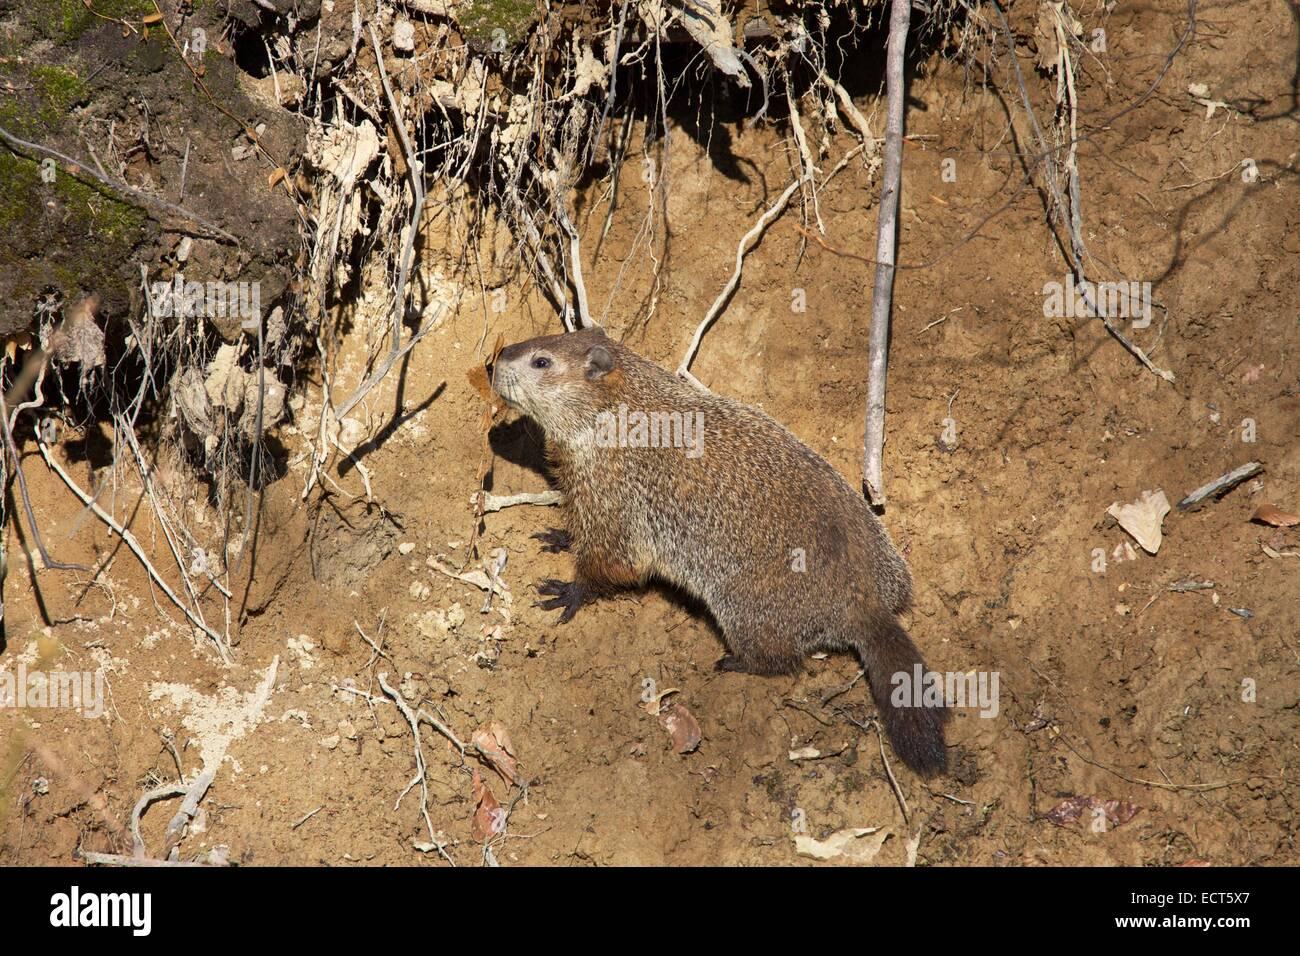 Groundhog on the bank of a creek - Stock Image